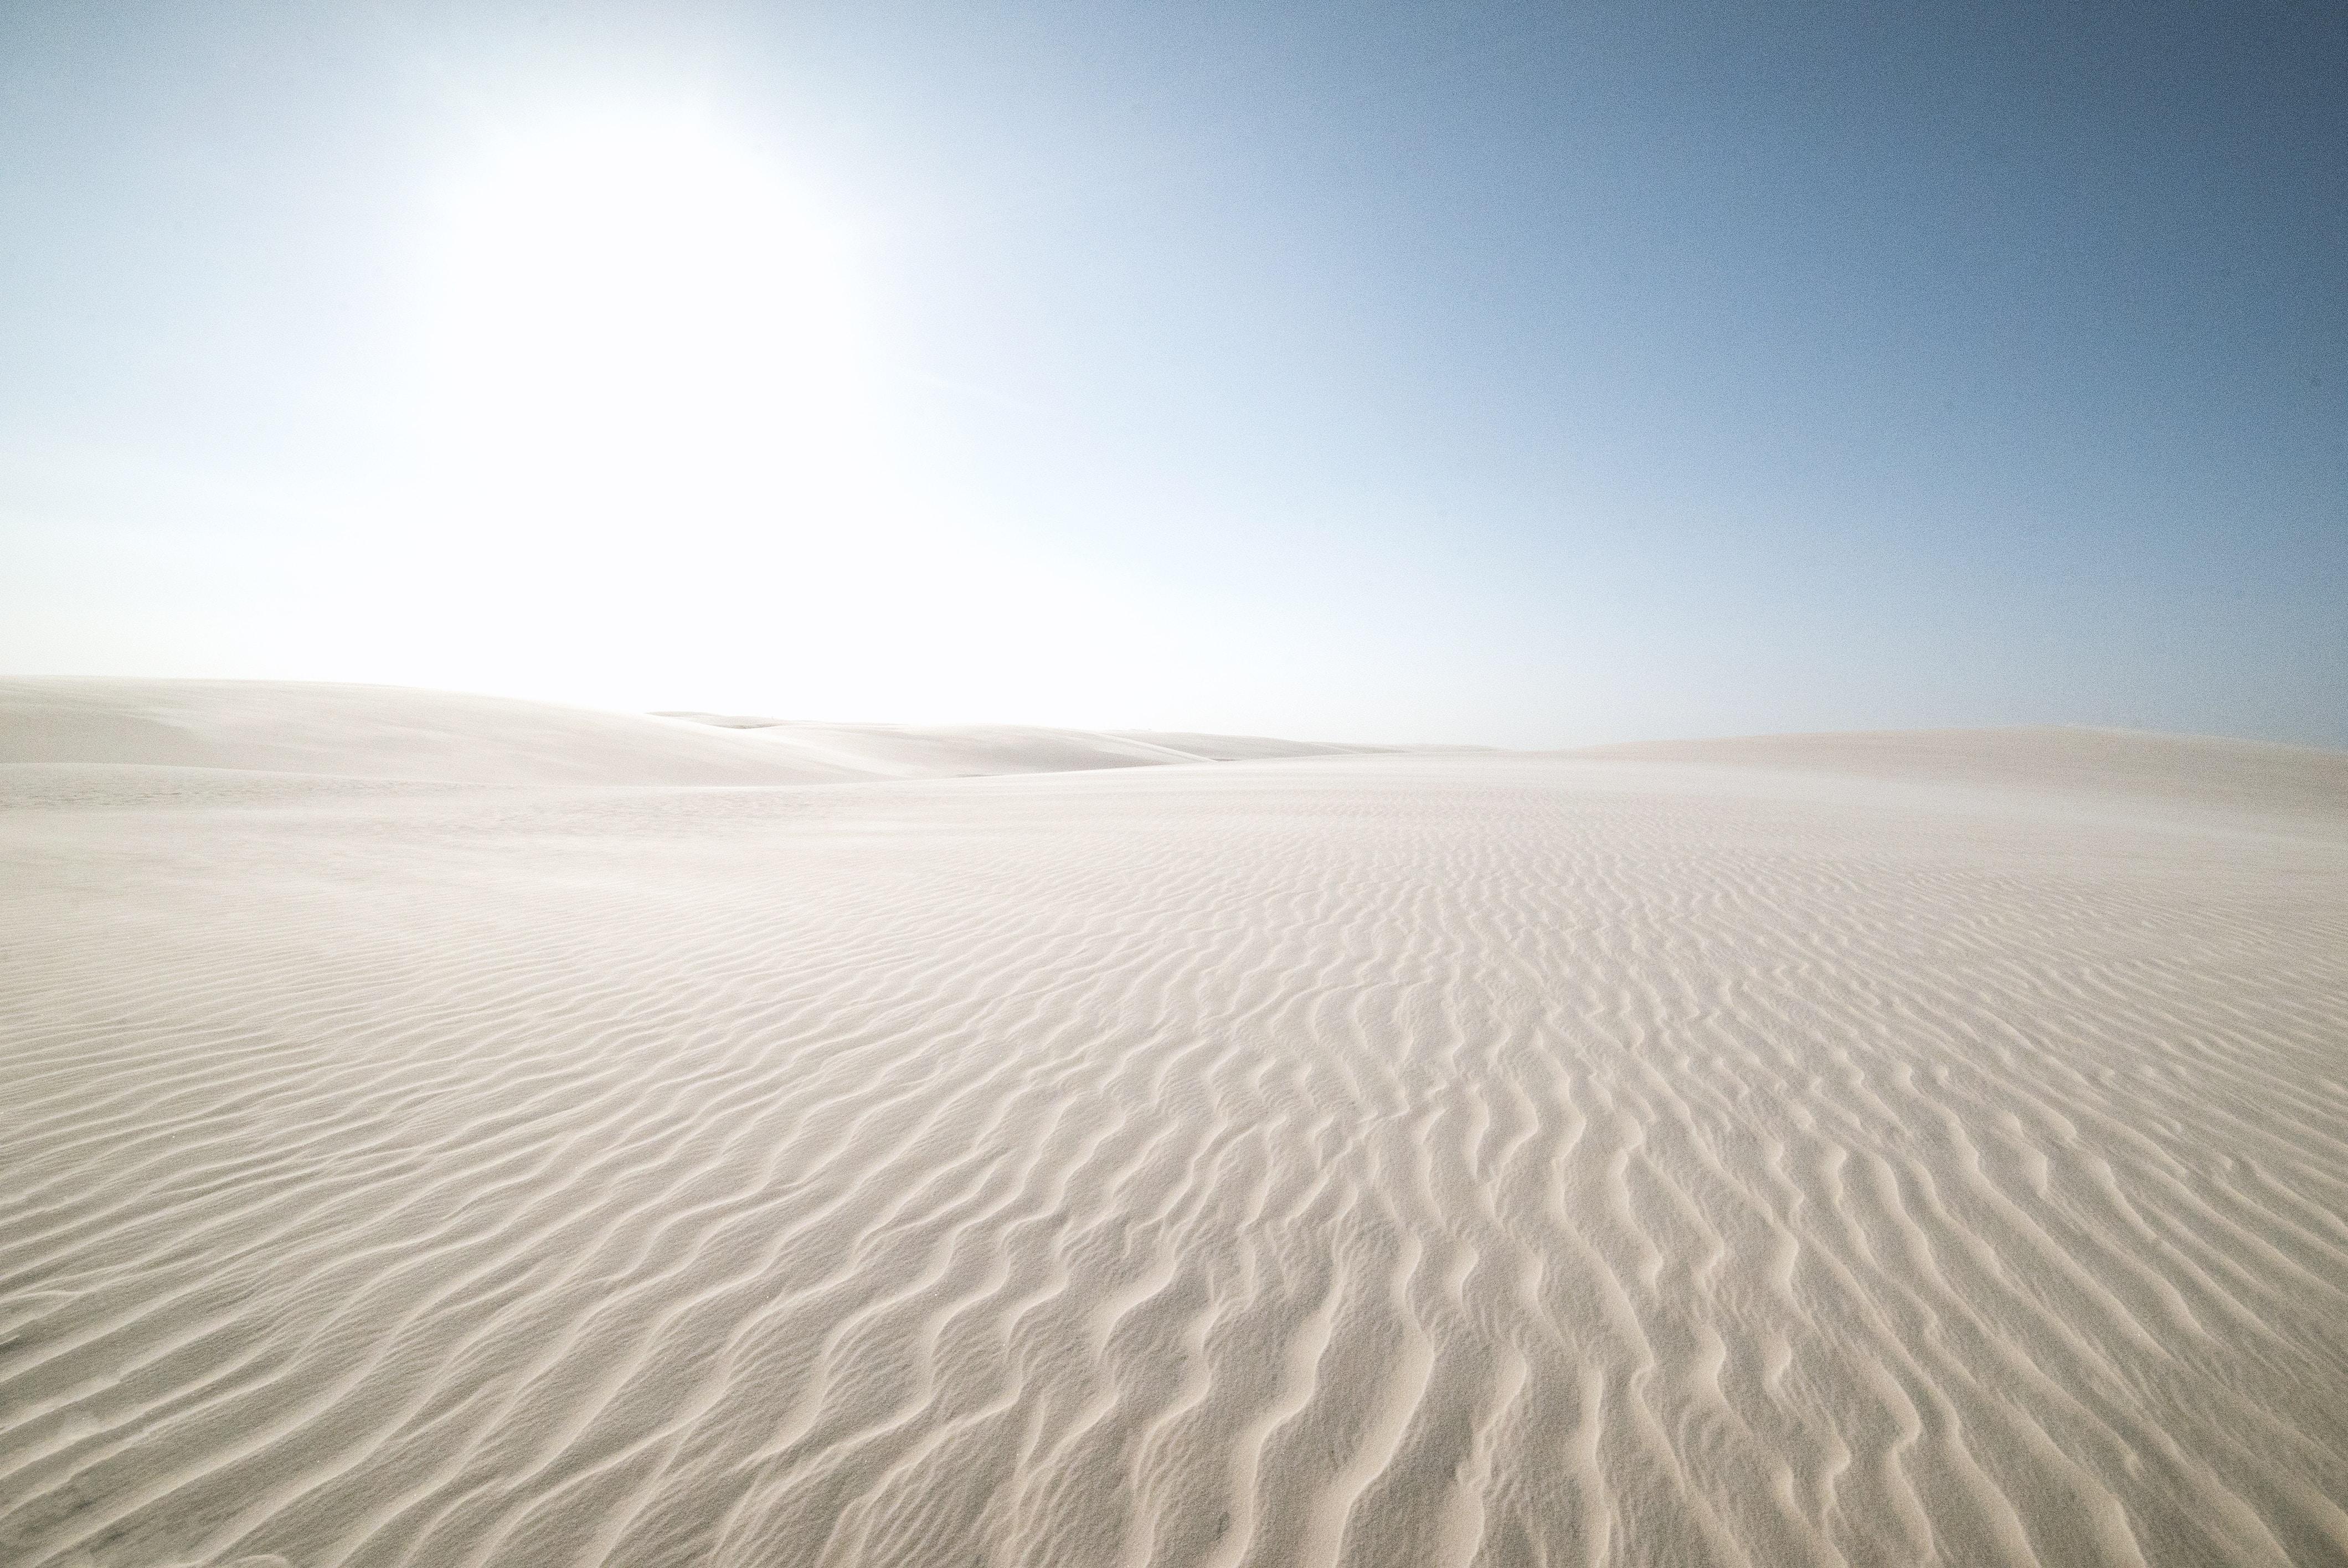 gray sand dunes